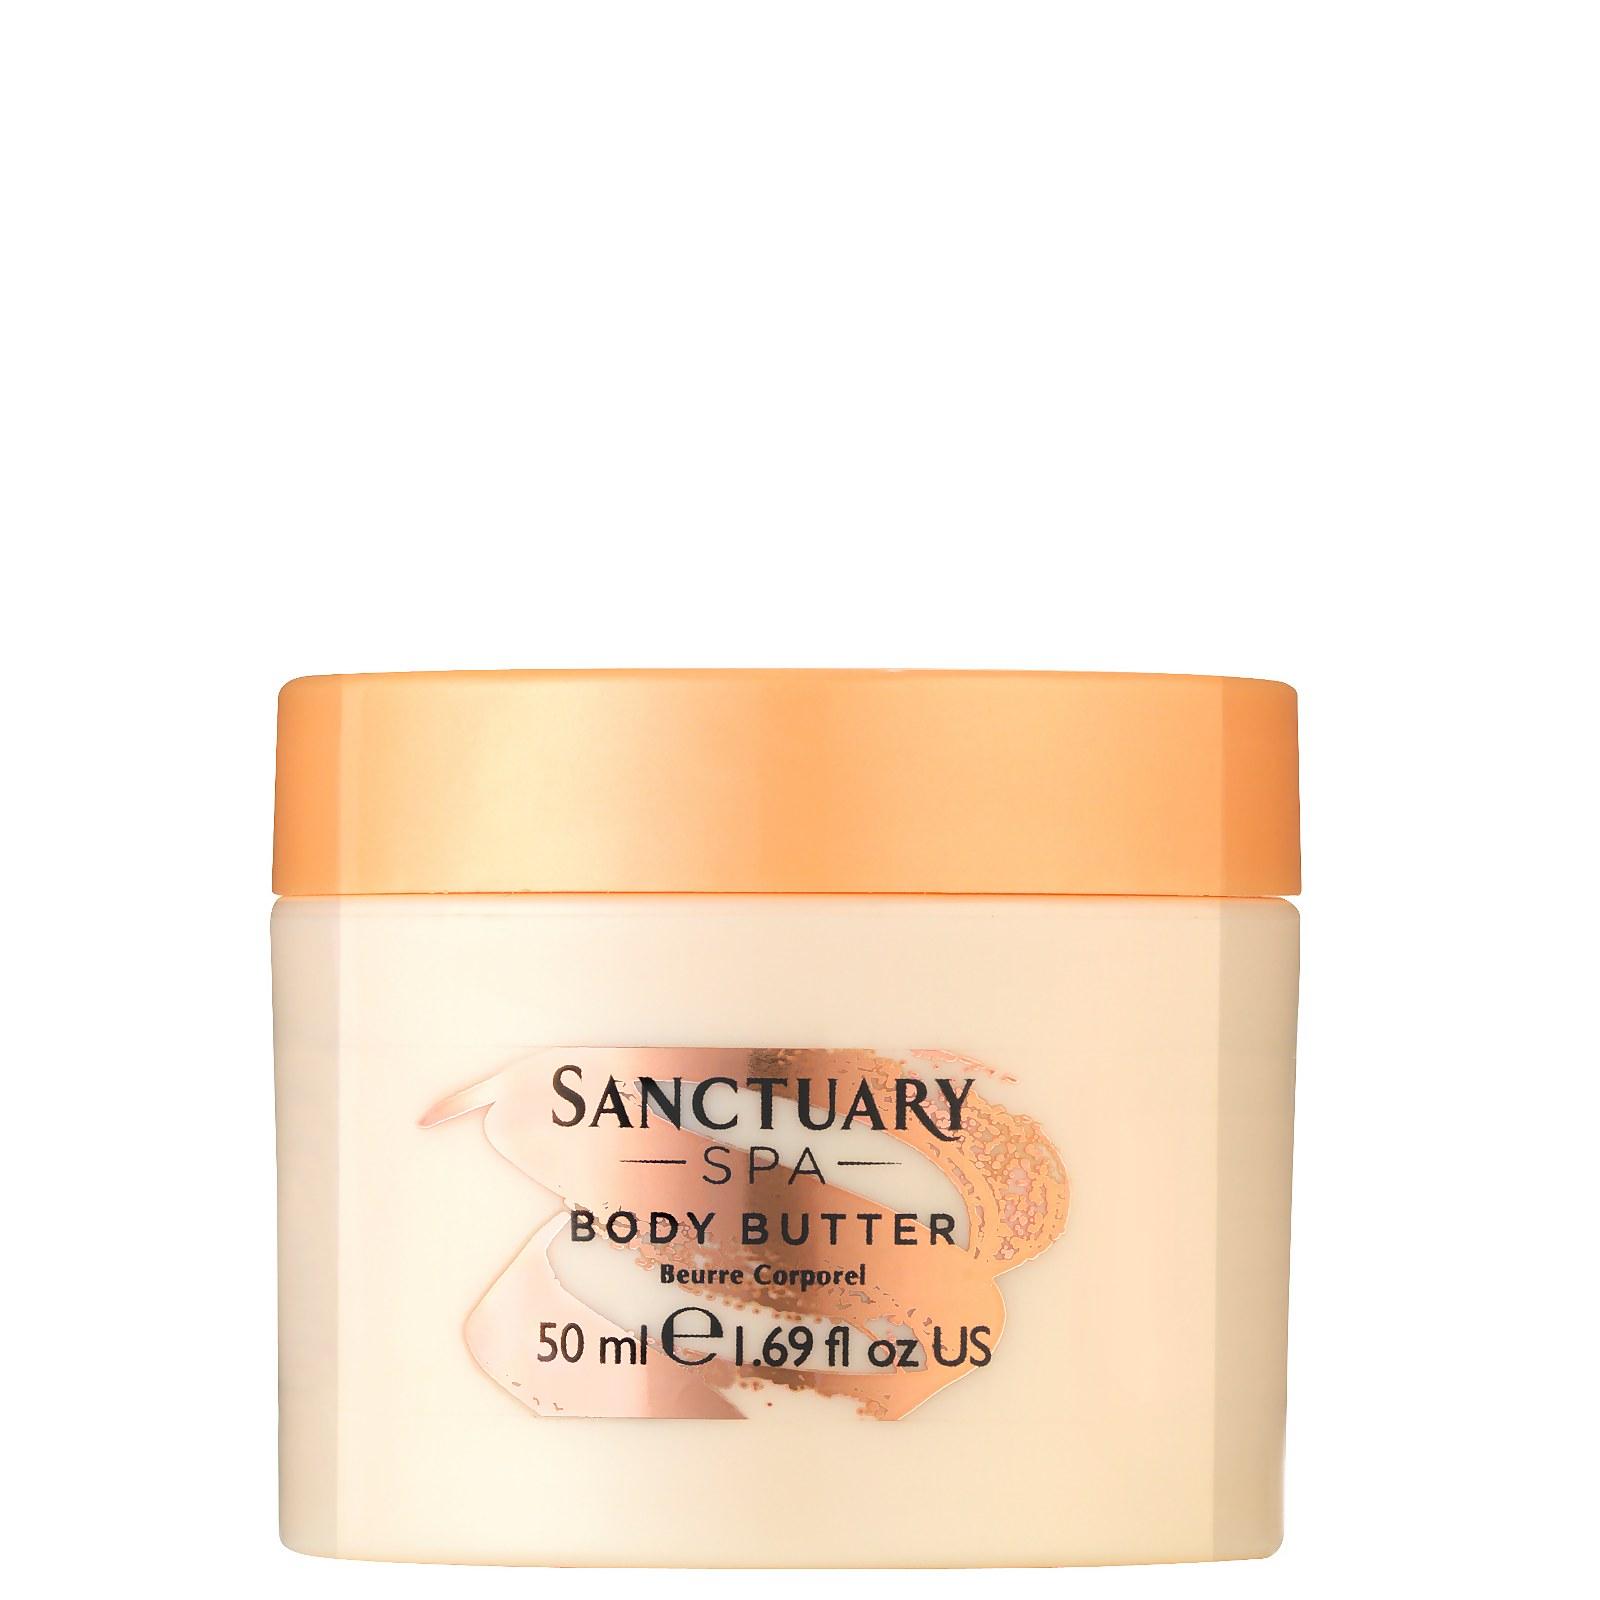 Sanctuary Spa Body Butter 50ml